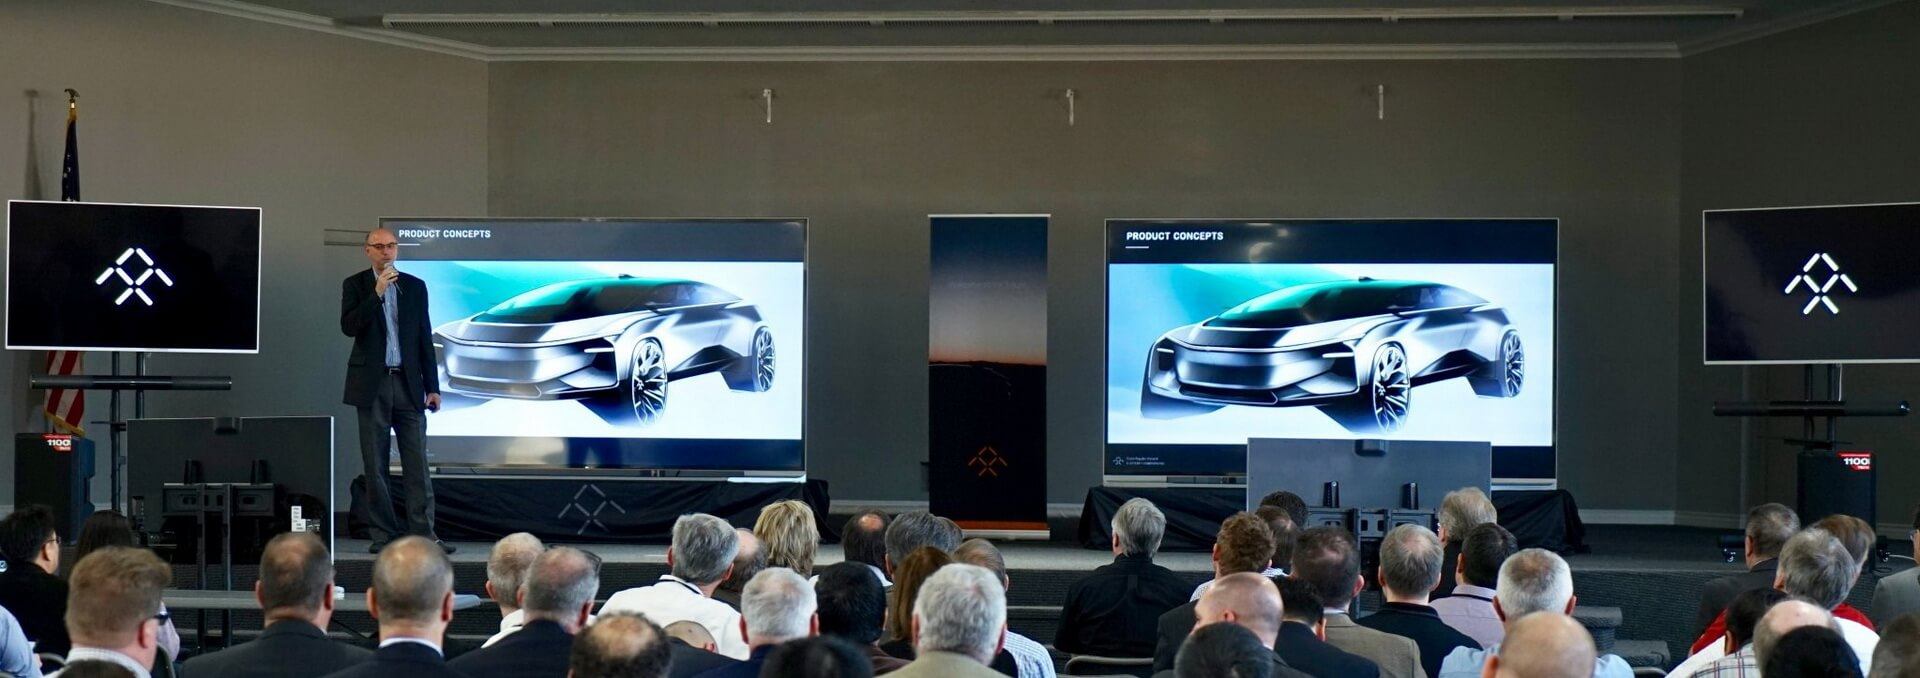 Фотографии прототипа будущего электрокара Faraday Future